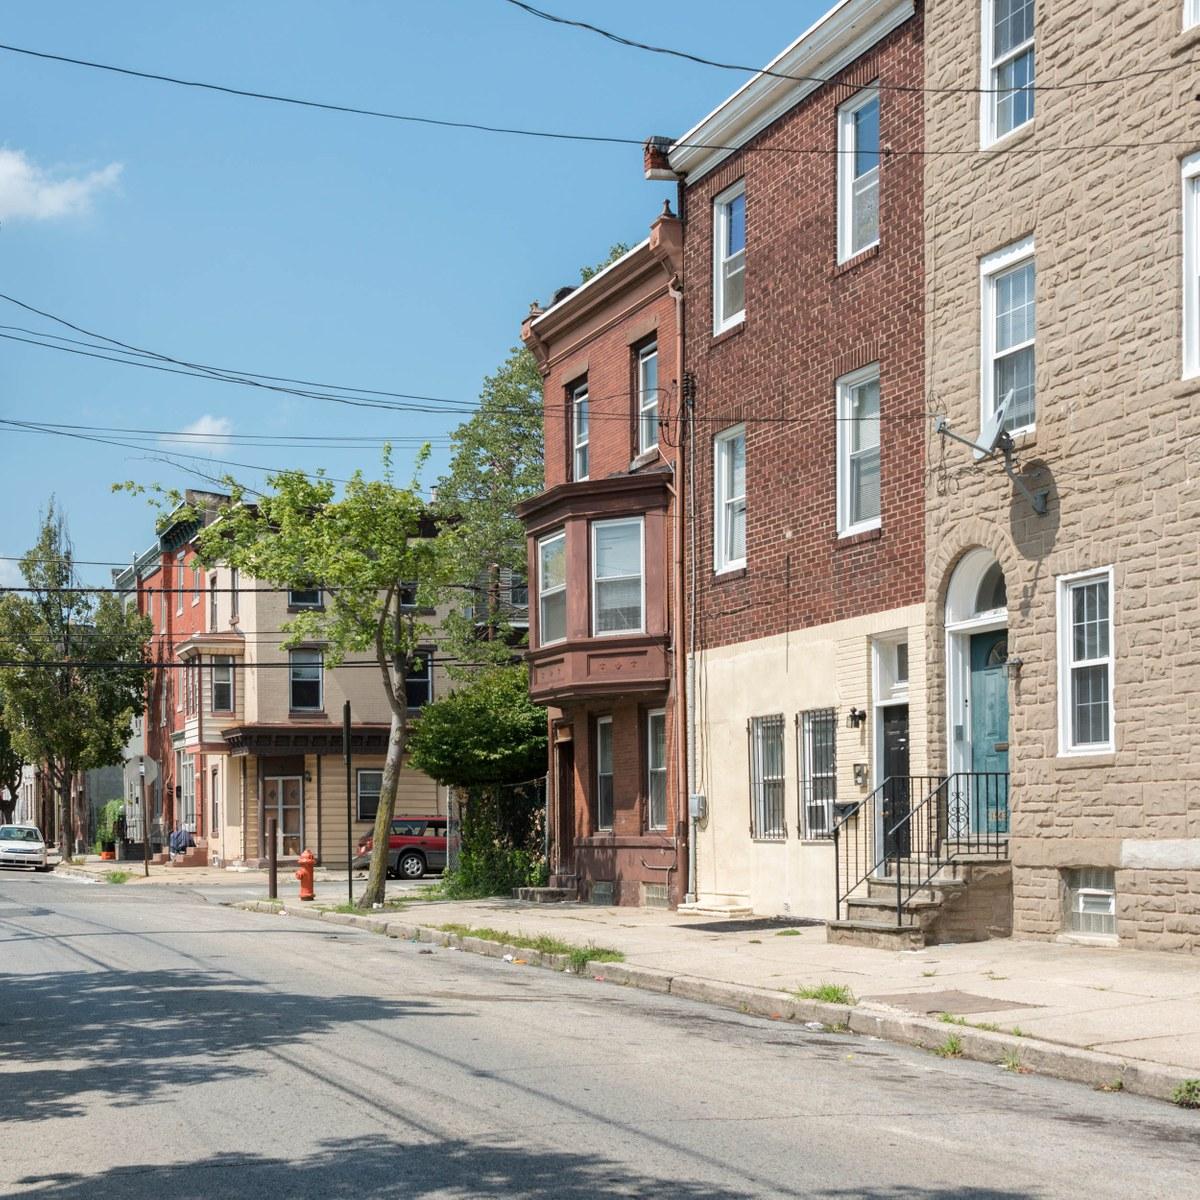 Local Com Homes For Rent: North Central, Philadelphia PA - Neighborhood Guide